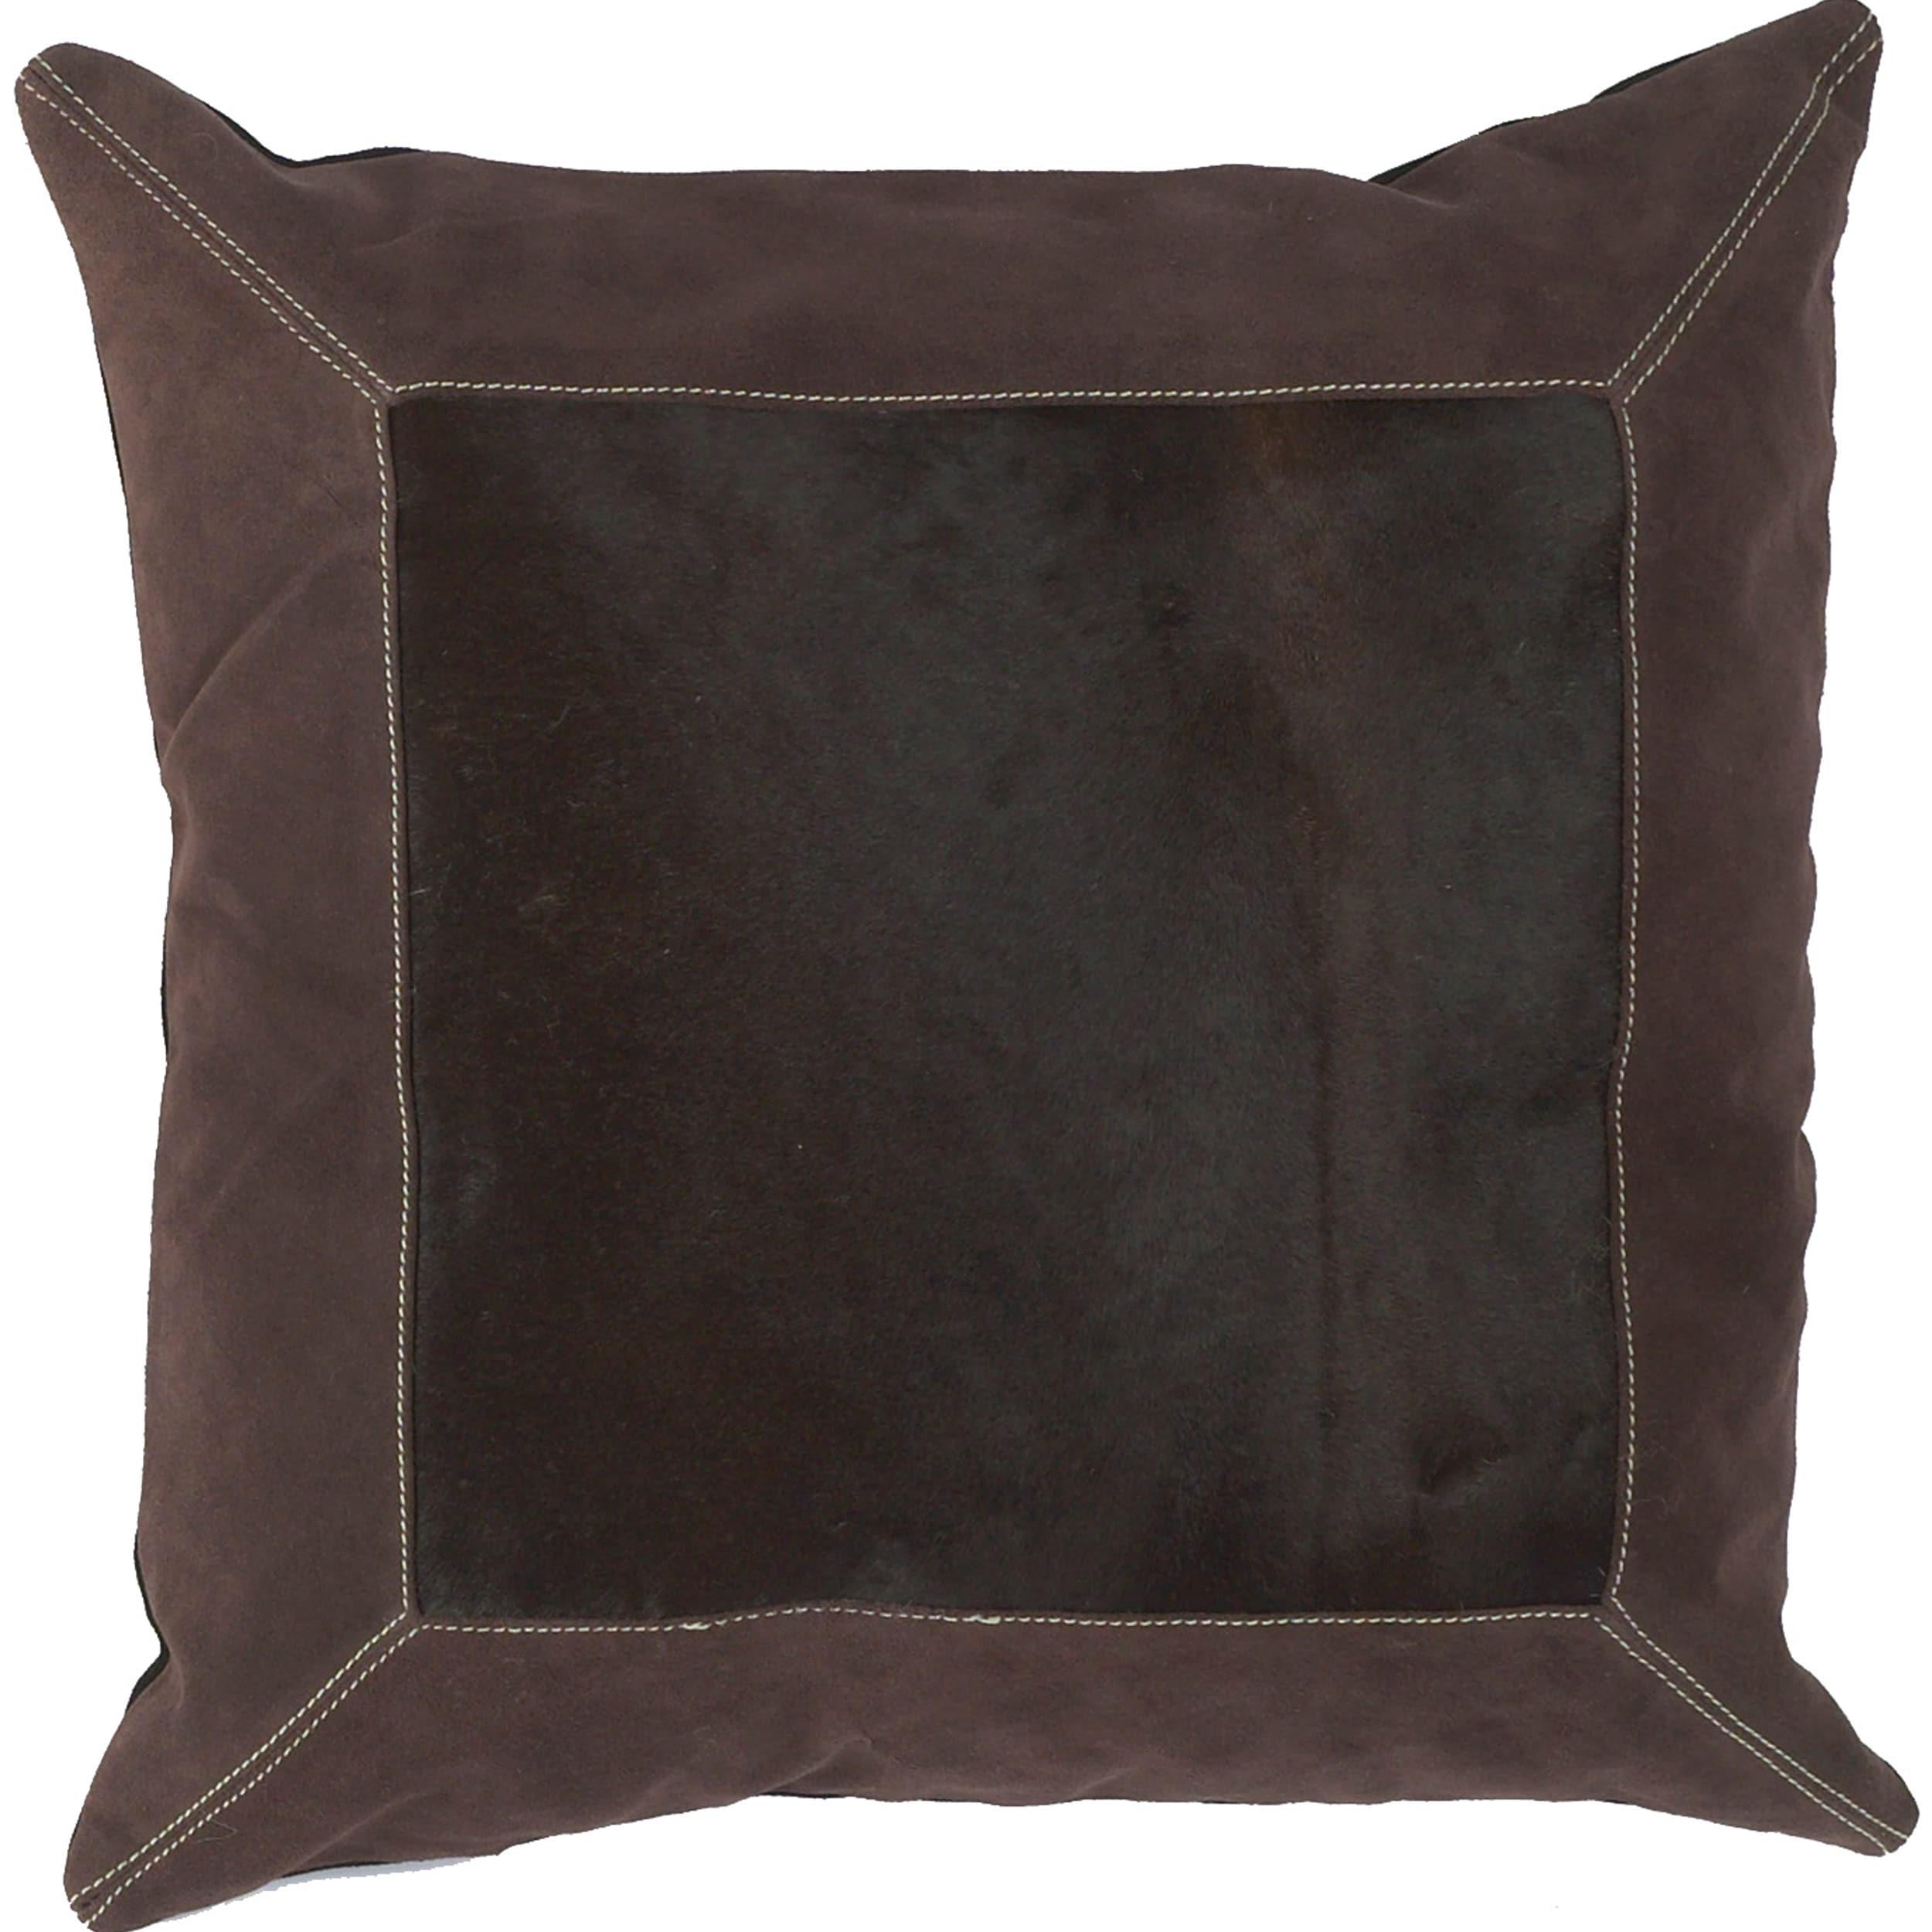 Decorative Alstead Down Pillow